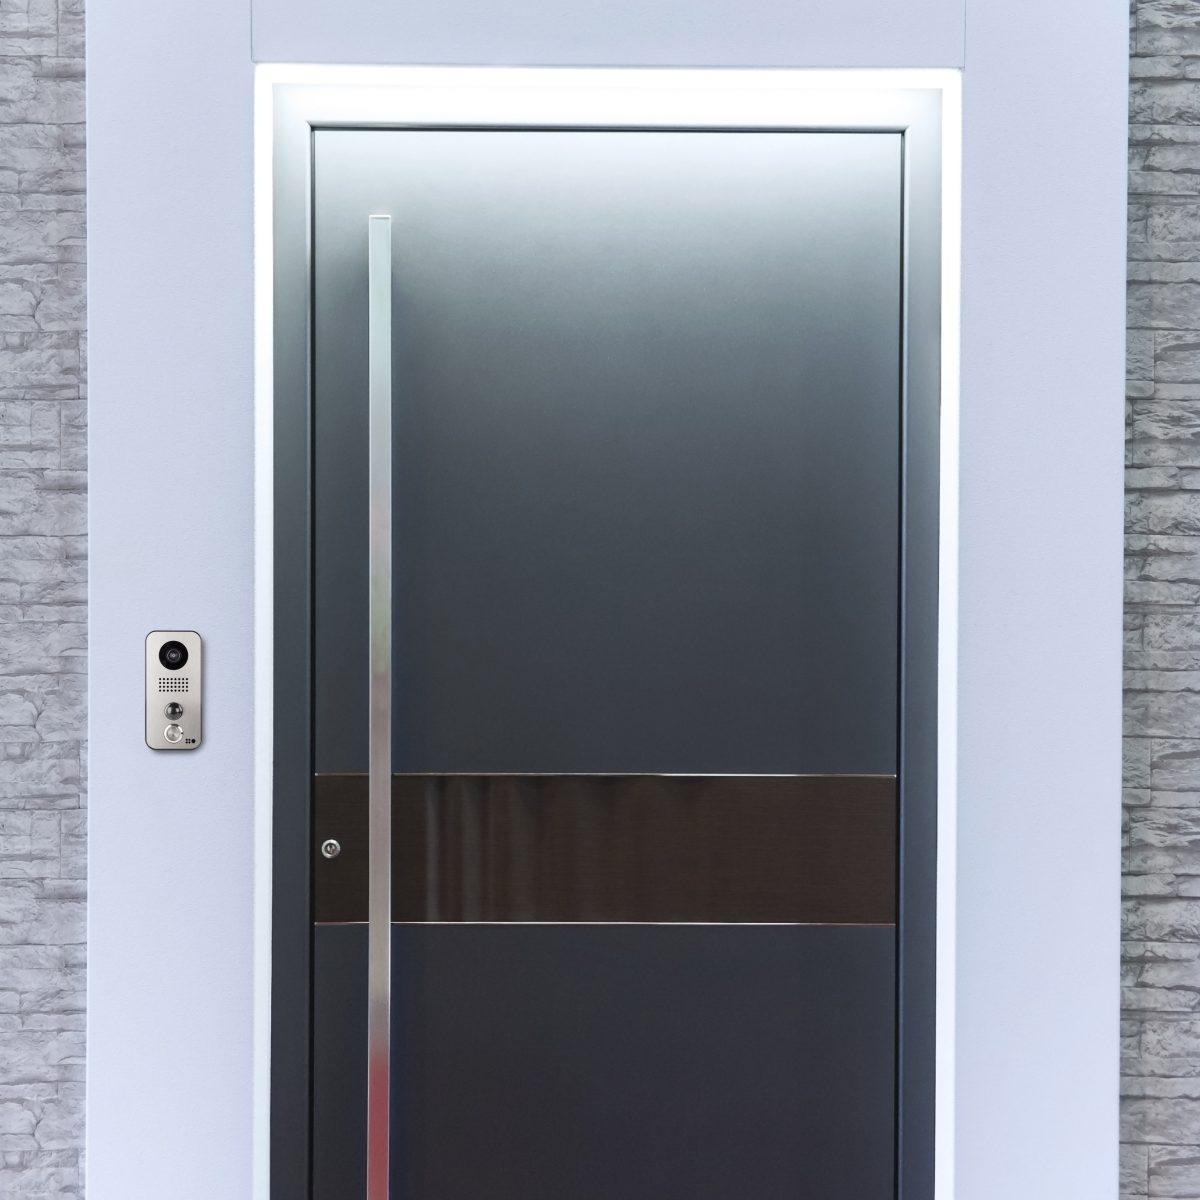 Door Station Amp Ds Kd8002 Vm Video Intercom Water Proof